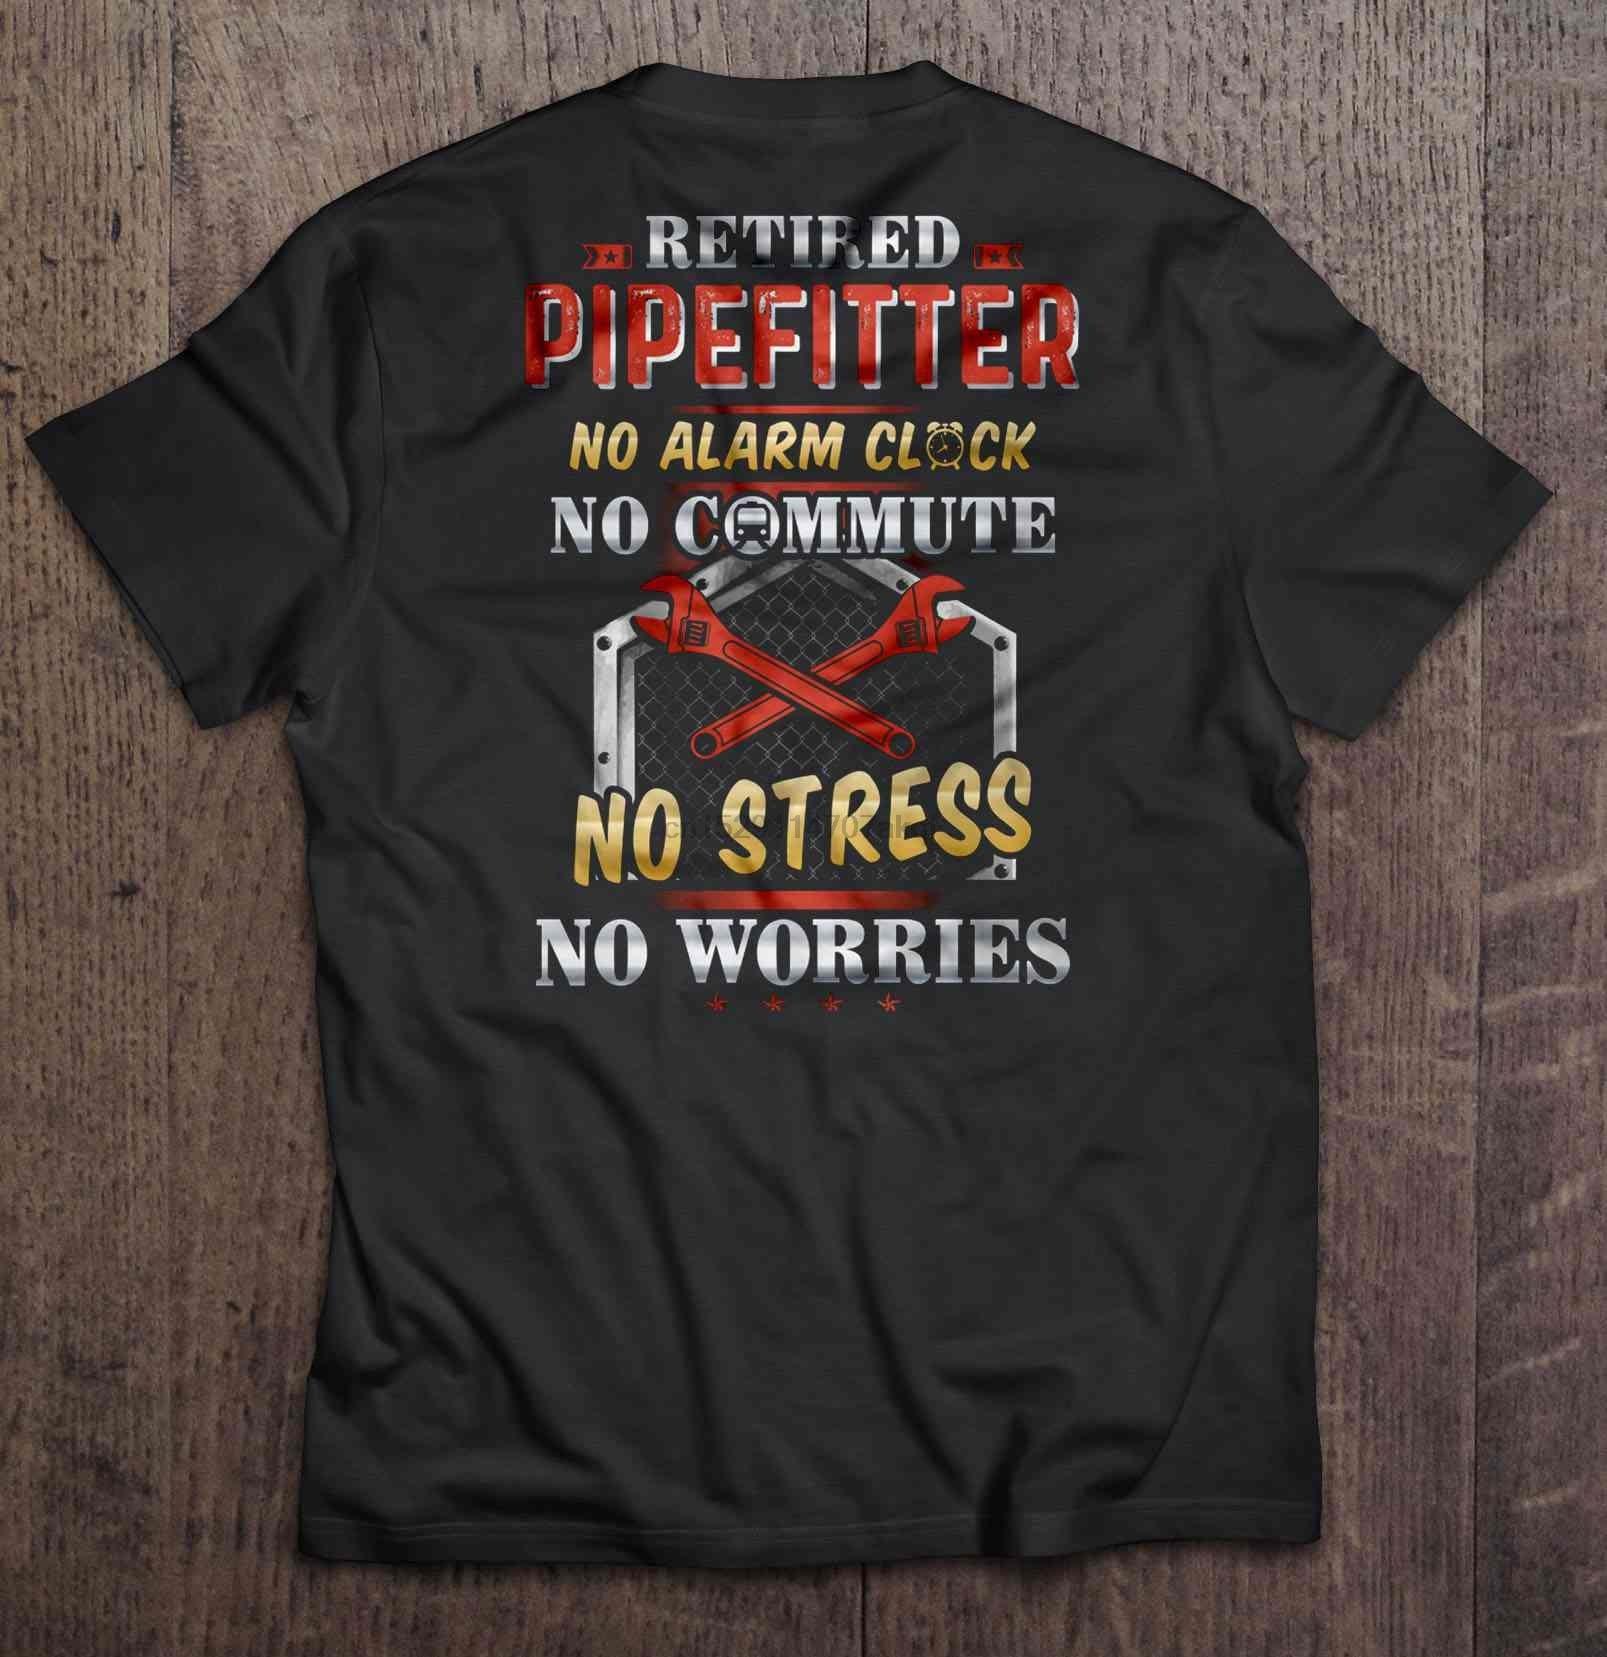 Men Funny T Shirt Fashion tshirt Retired Pipefitter No Alarm Clock No Commute No Stress No Worries Women t-shirt